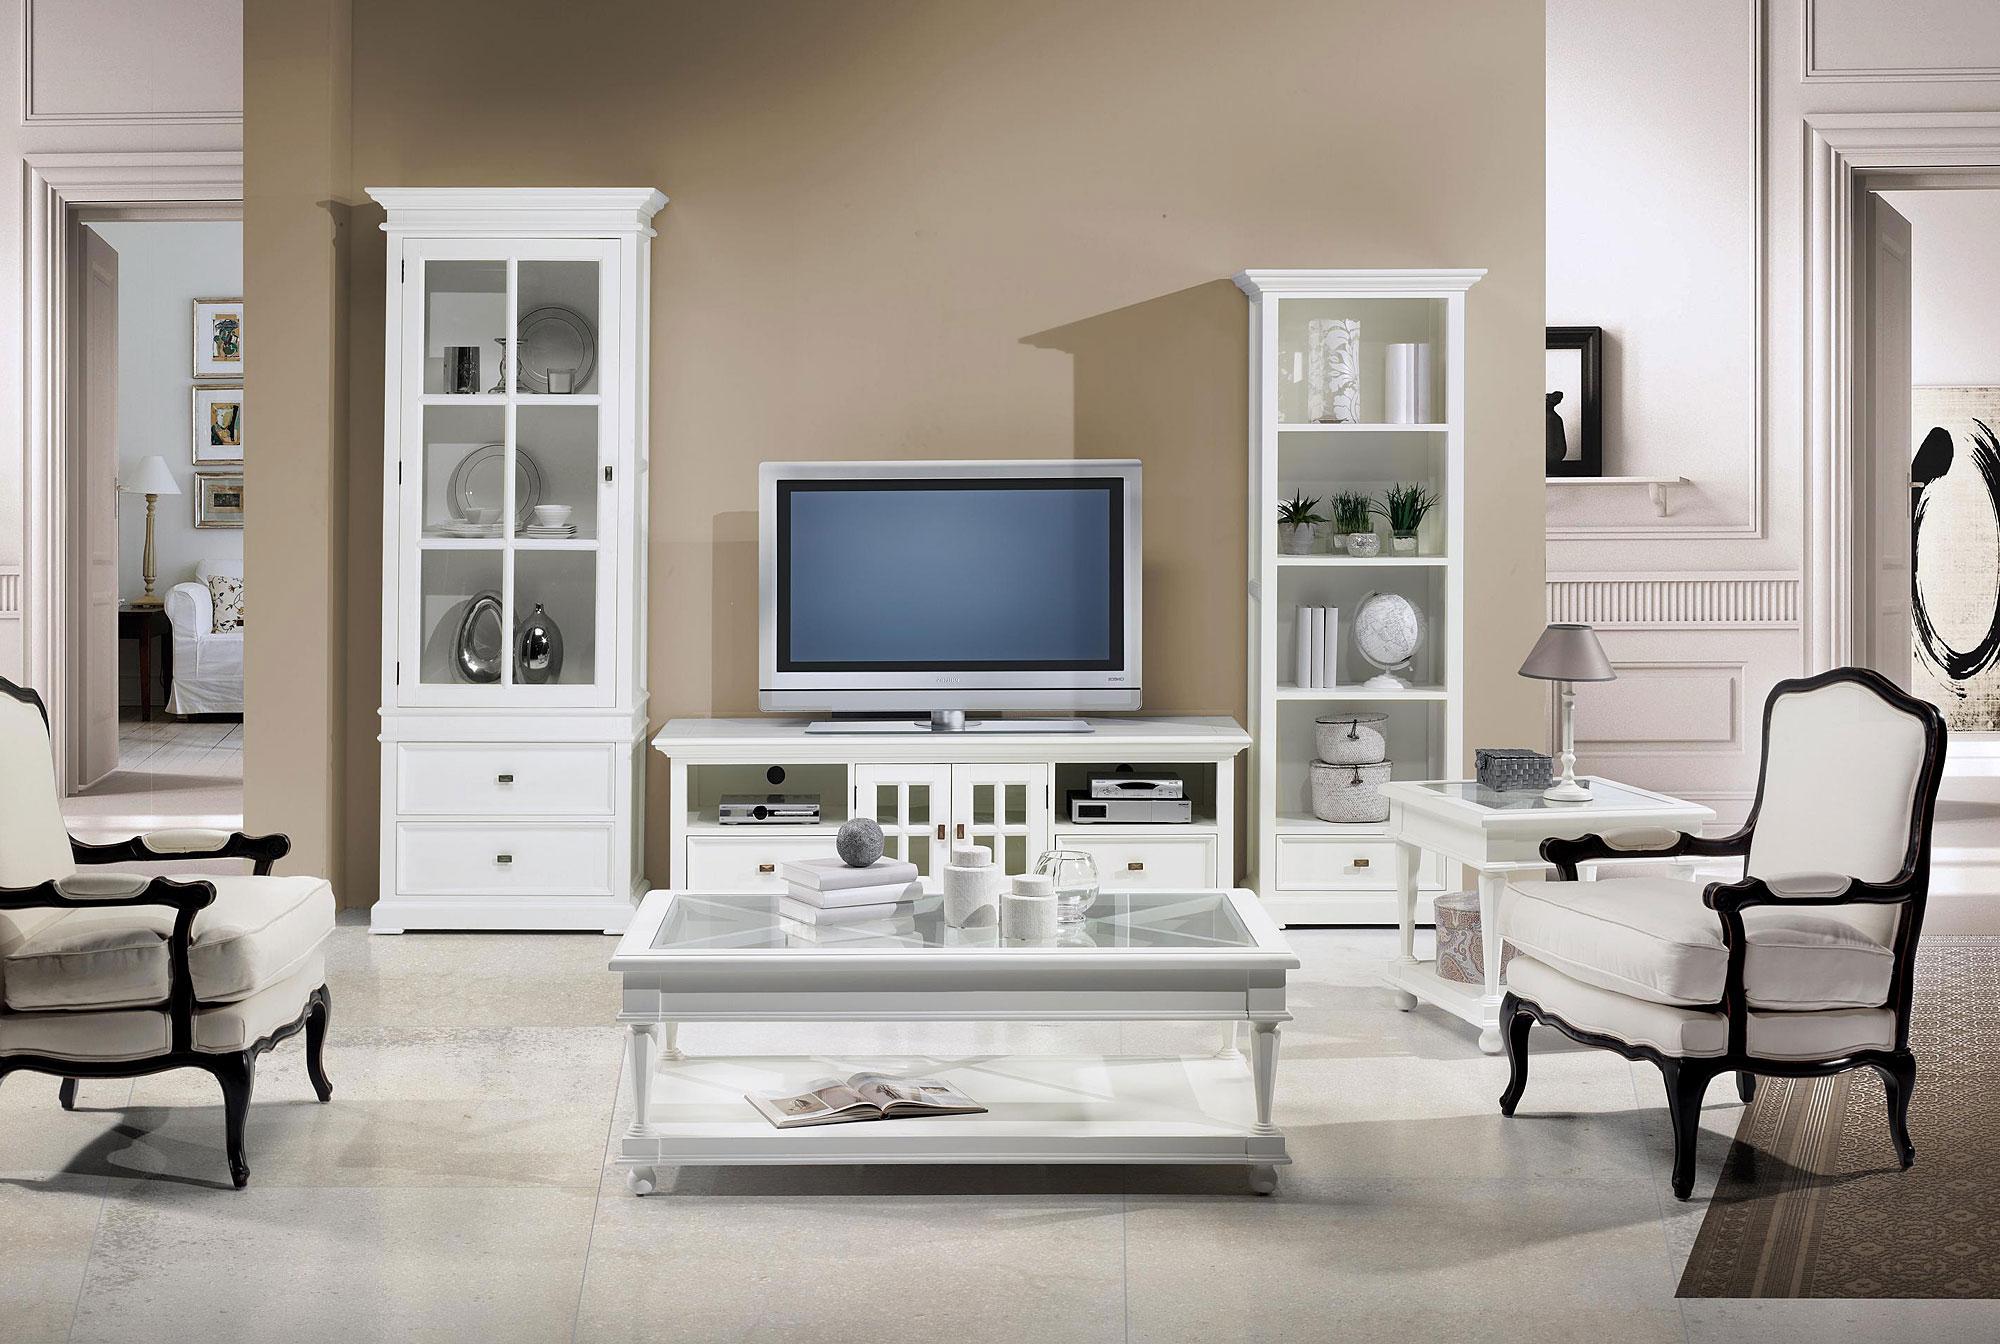 Decorar Mueble Salon Mndw Decoracion Mueble sofa Muebles Salon Blanco